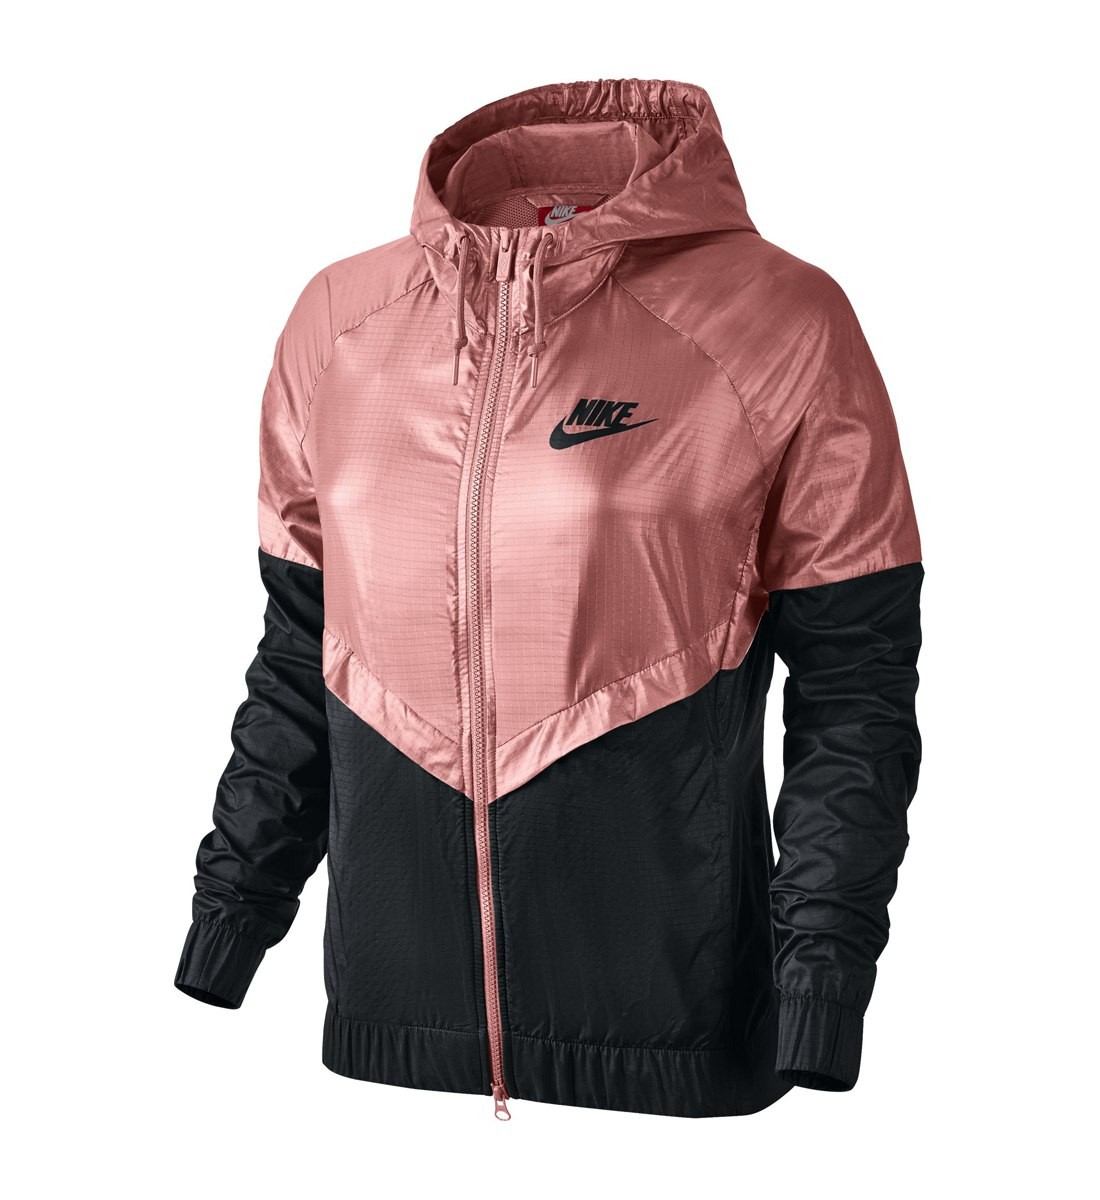 Vetement Pas Mode Nike Cher hdtsCQr